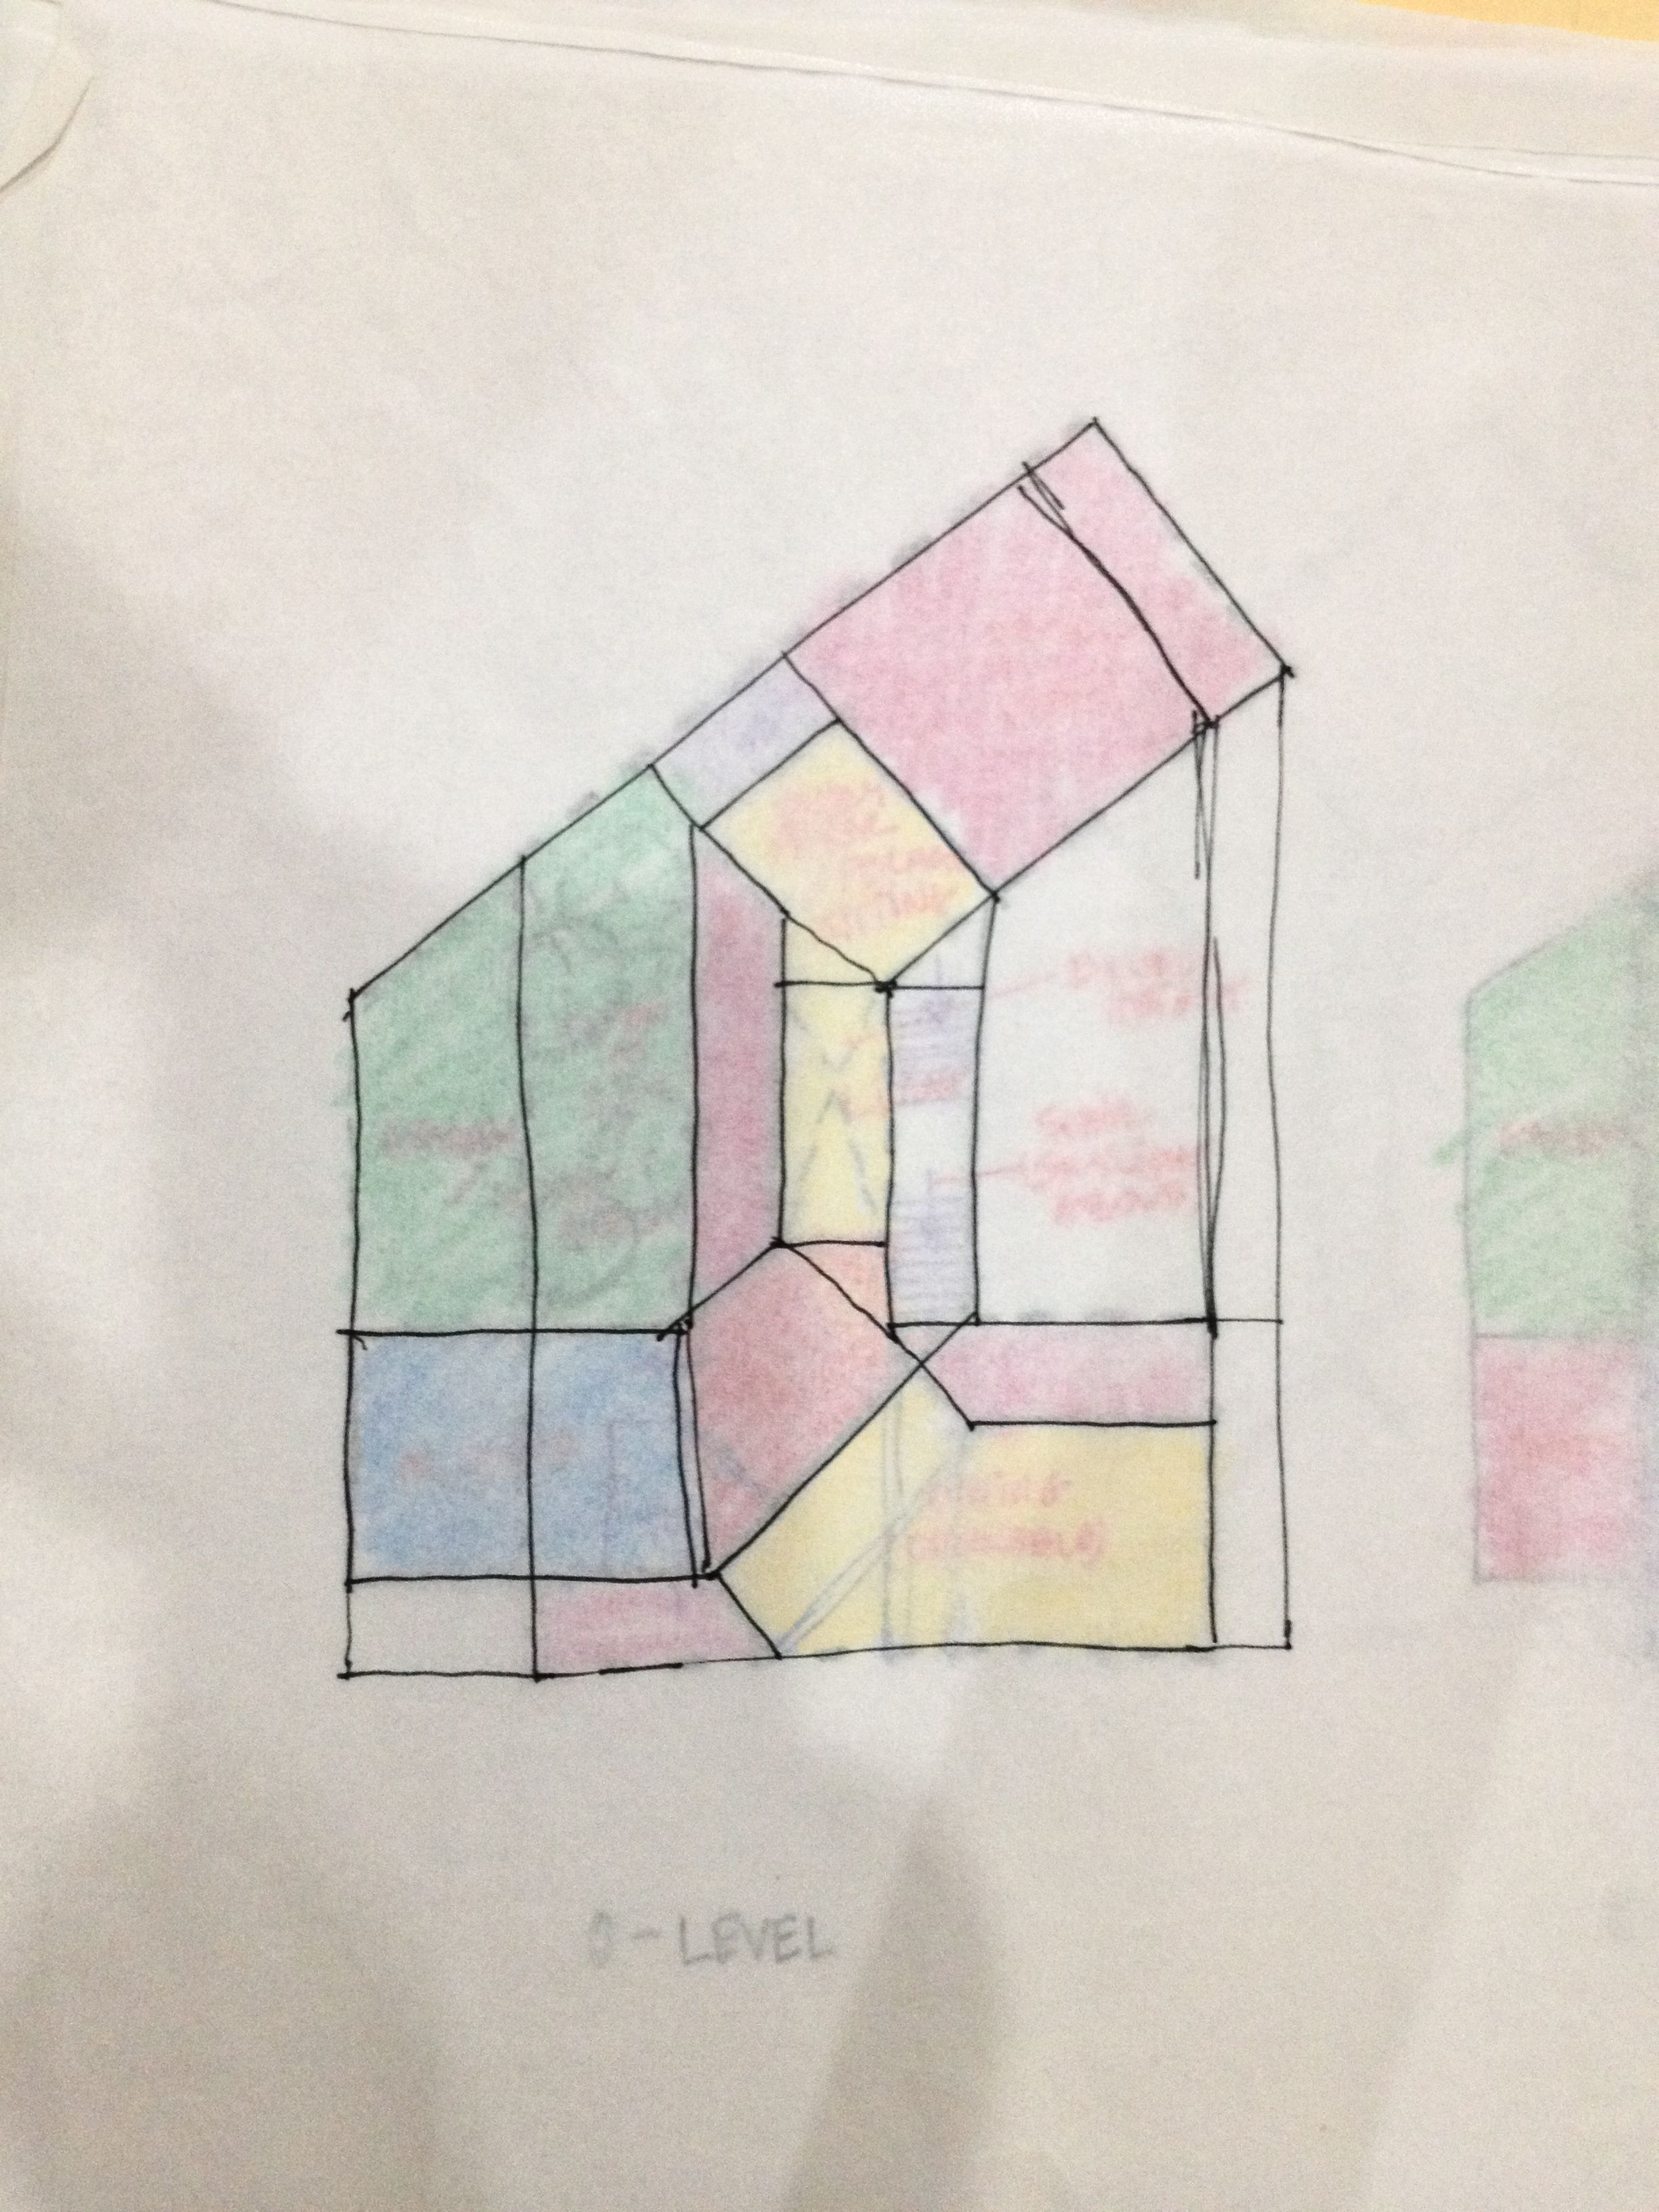 floor plan @ DesignAware